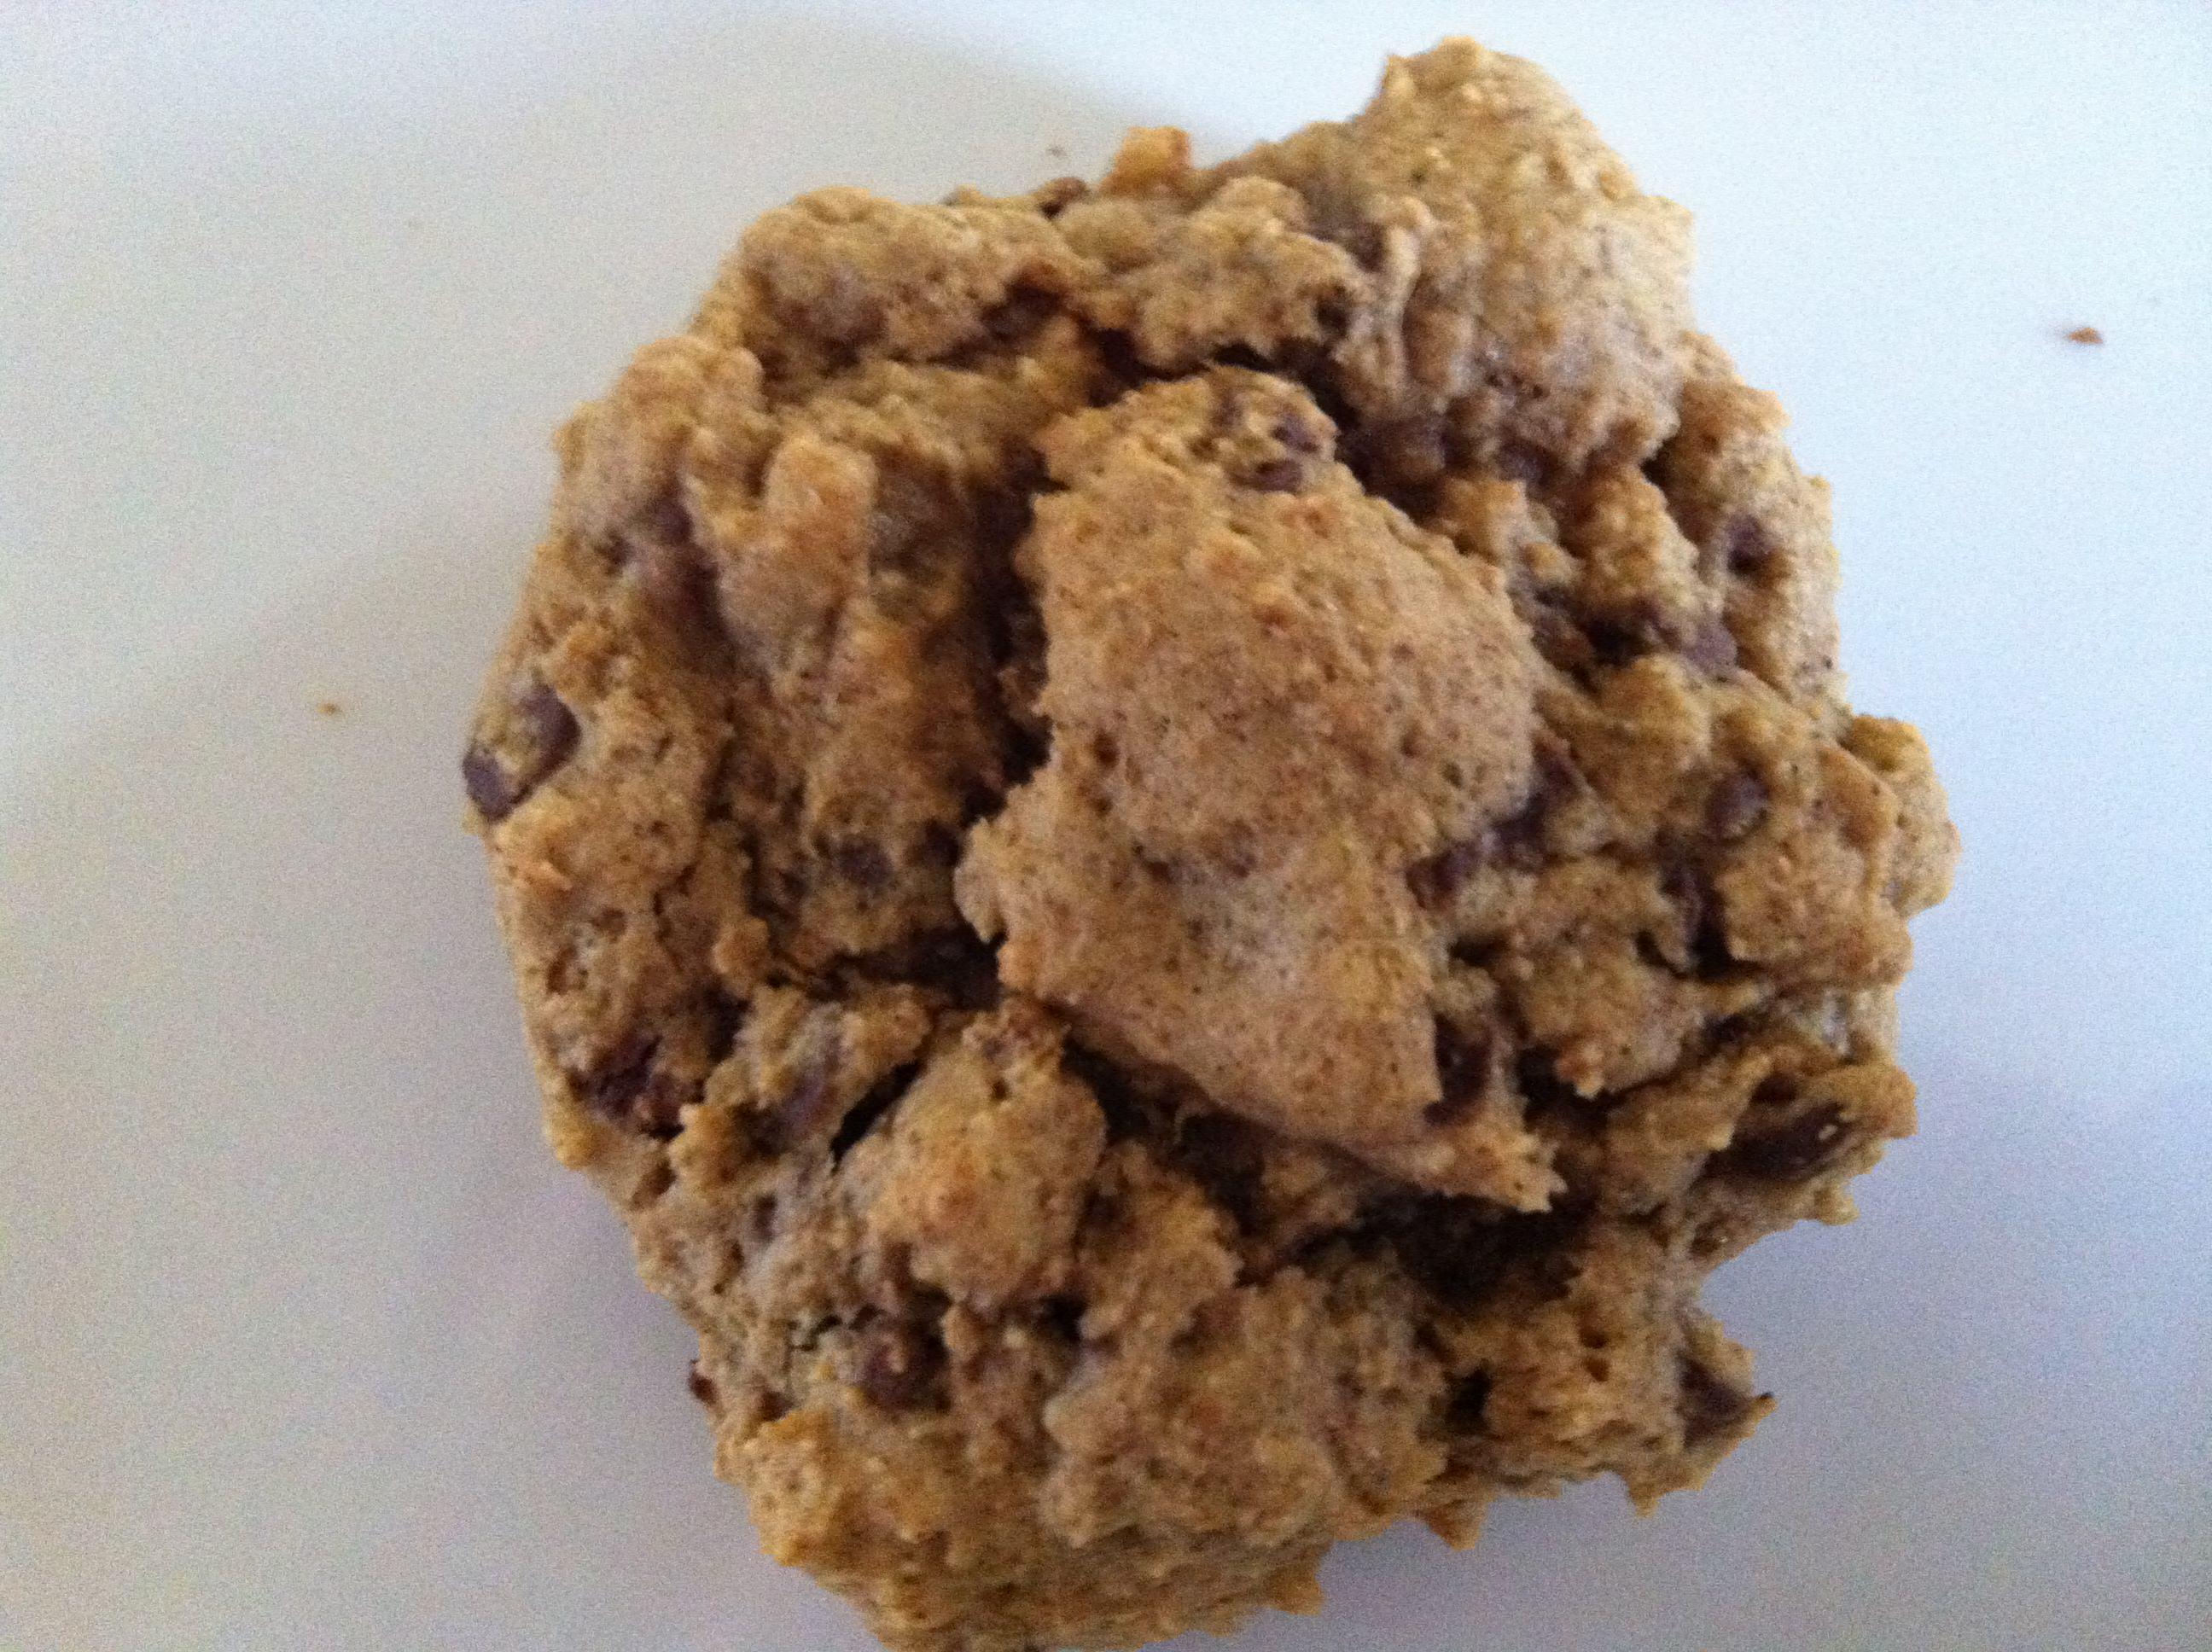 Pumpkin Spiced Chocolate Chip Cookies - yum